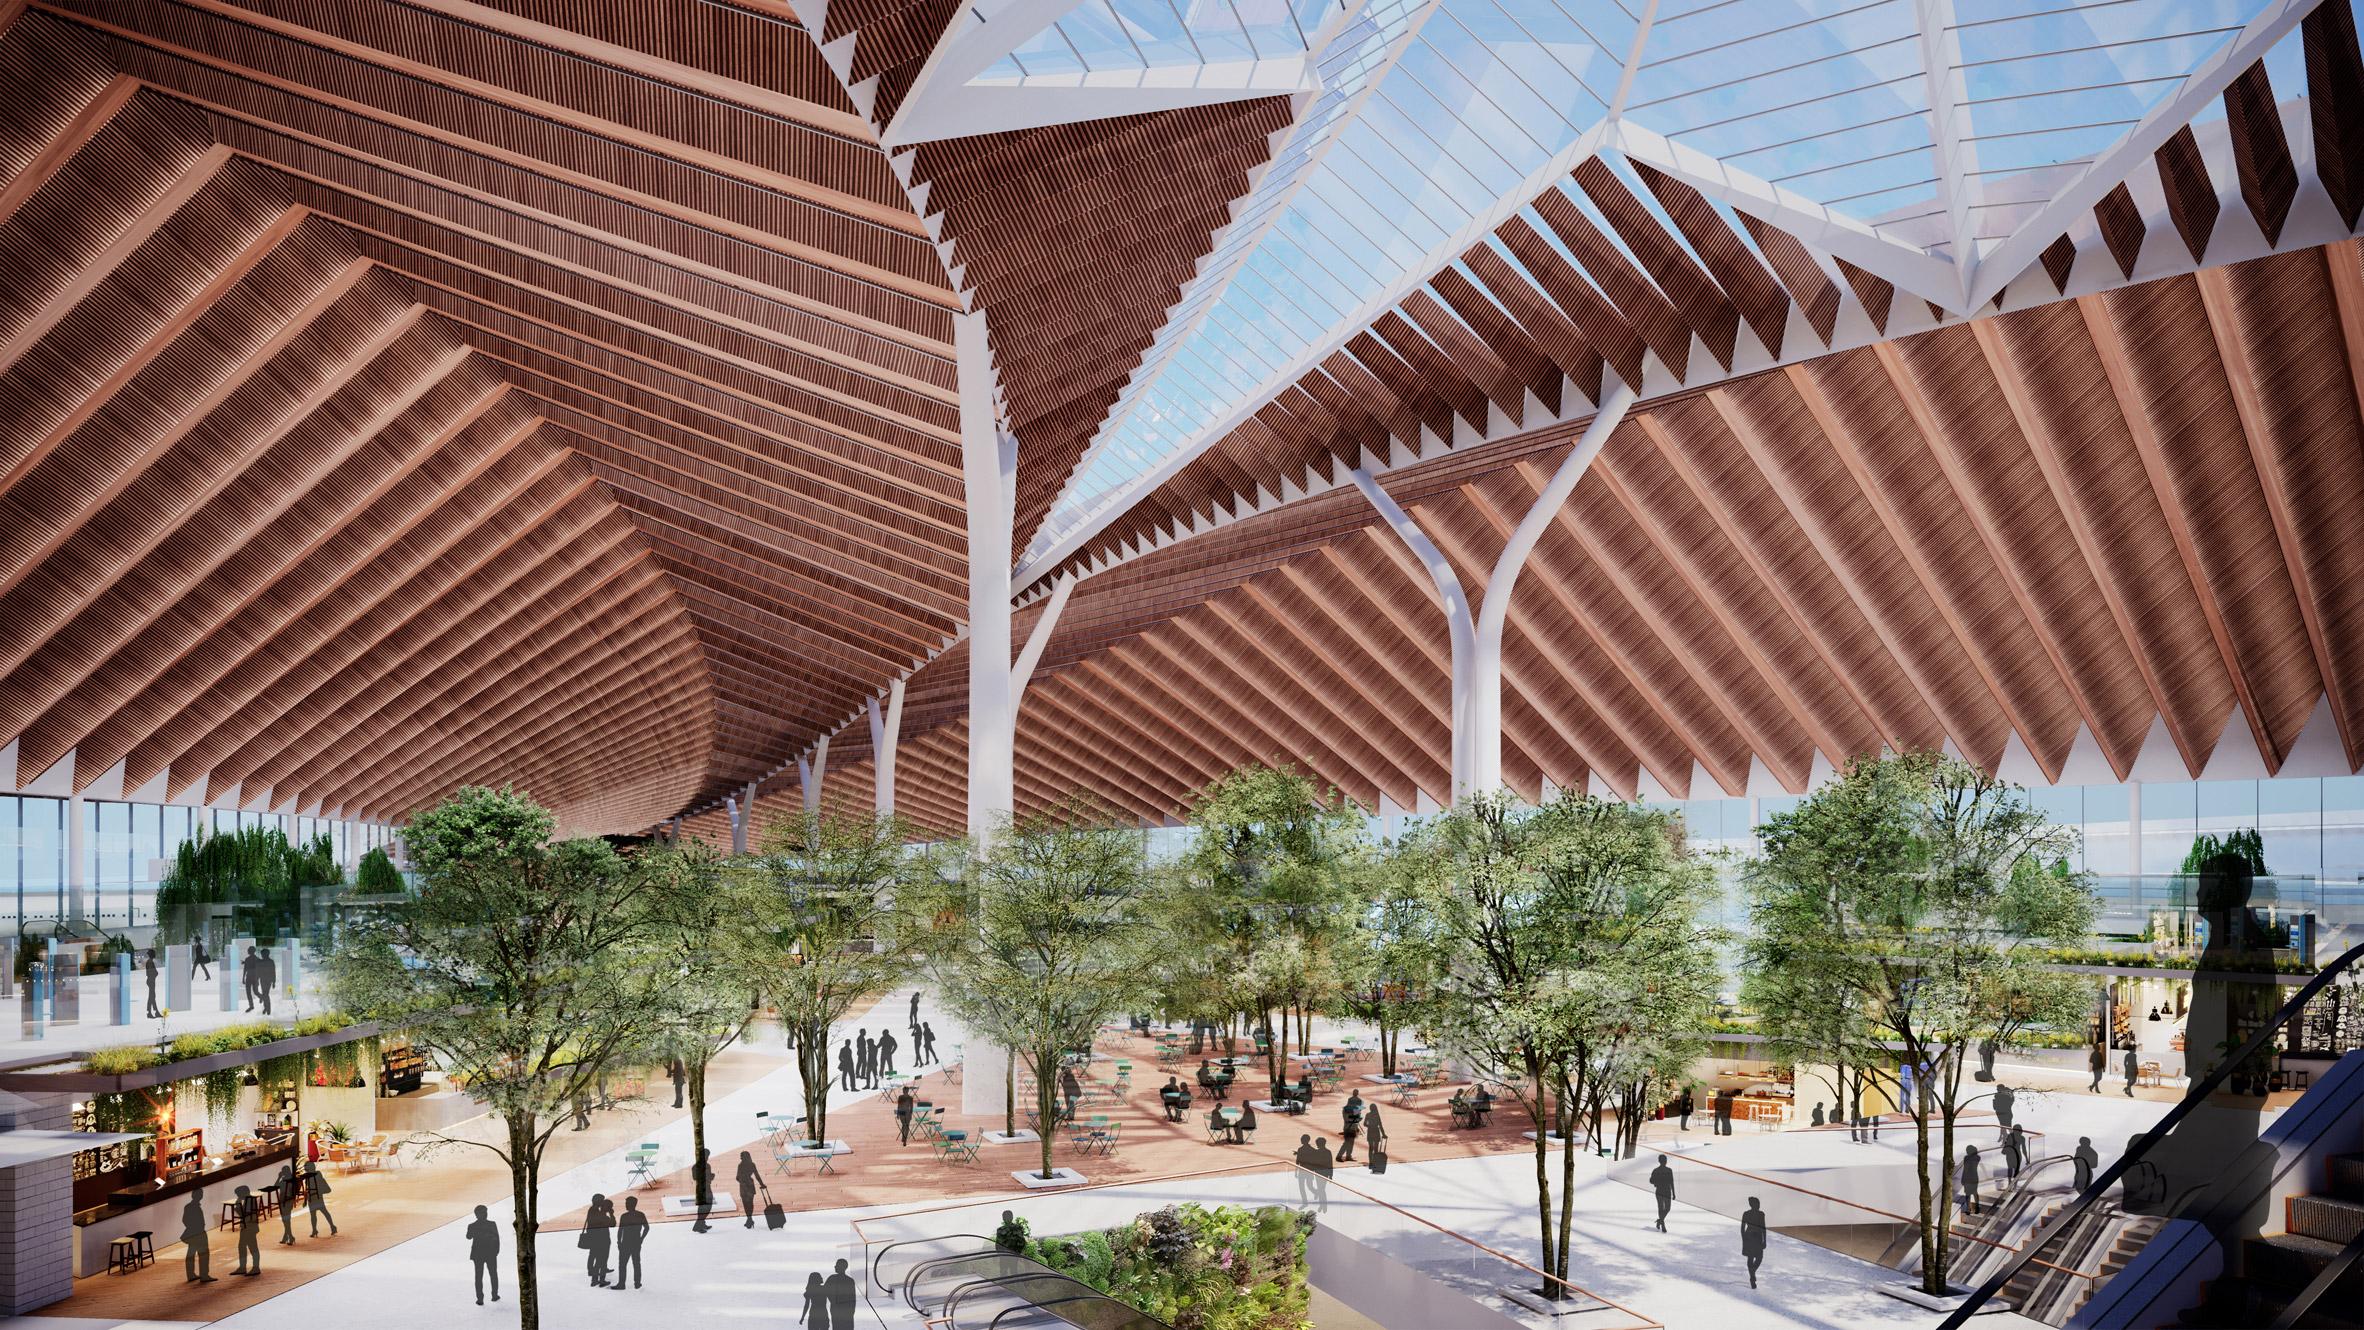 ohare-airport-studio-ord-studio-gang-news-architecture-chicago-illinois-usa_dezeen_2364_col_1.jpg